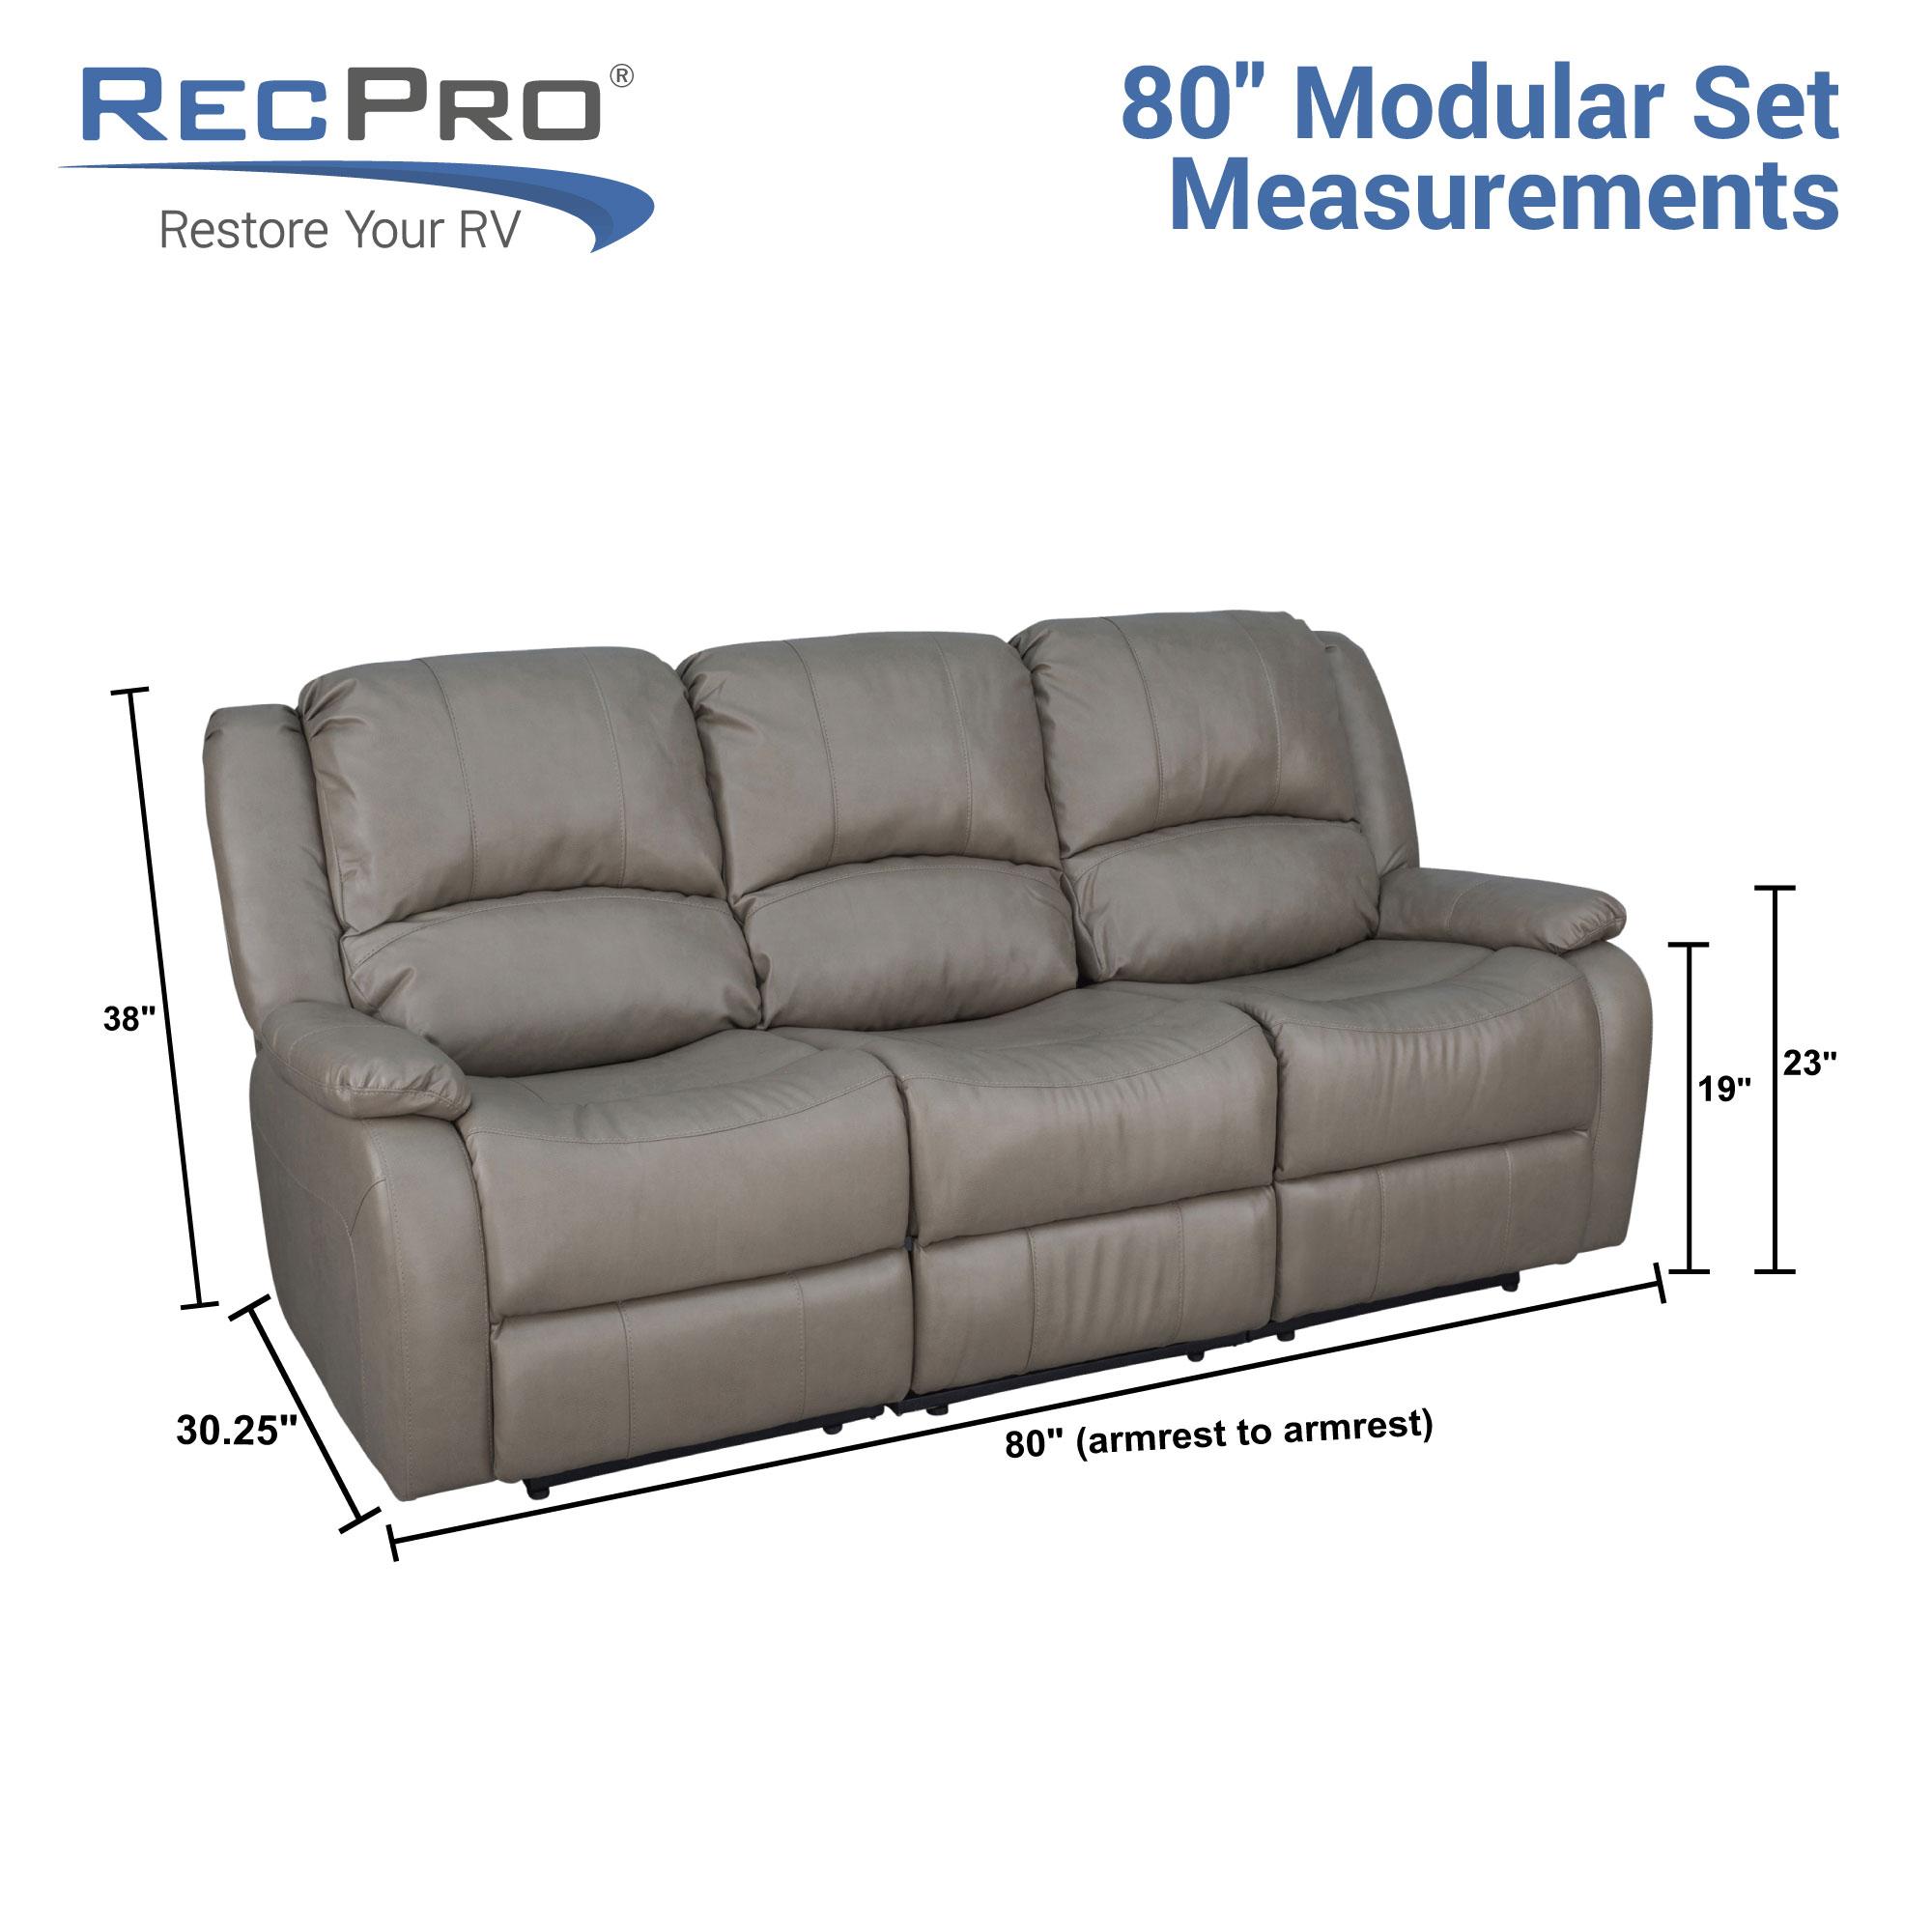 Astounding Recpro Charles 80 Triple Rv Wall Hugger Recliner Sofa With Machost Co Dining Chair Design Ideas Machostcouk